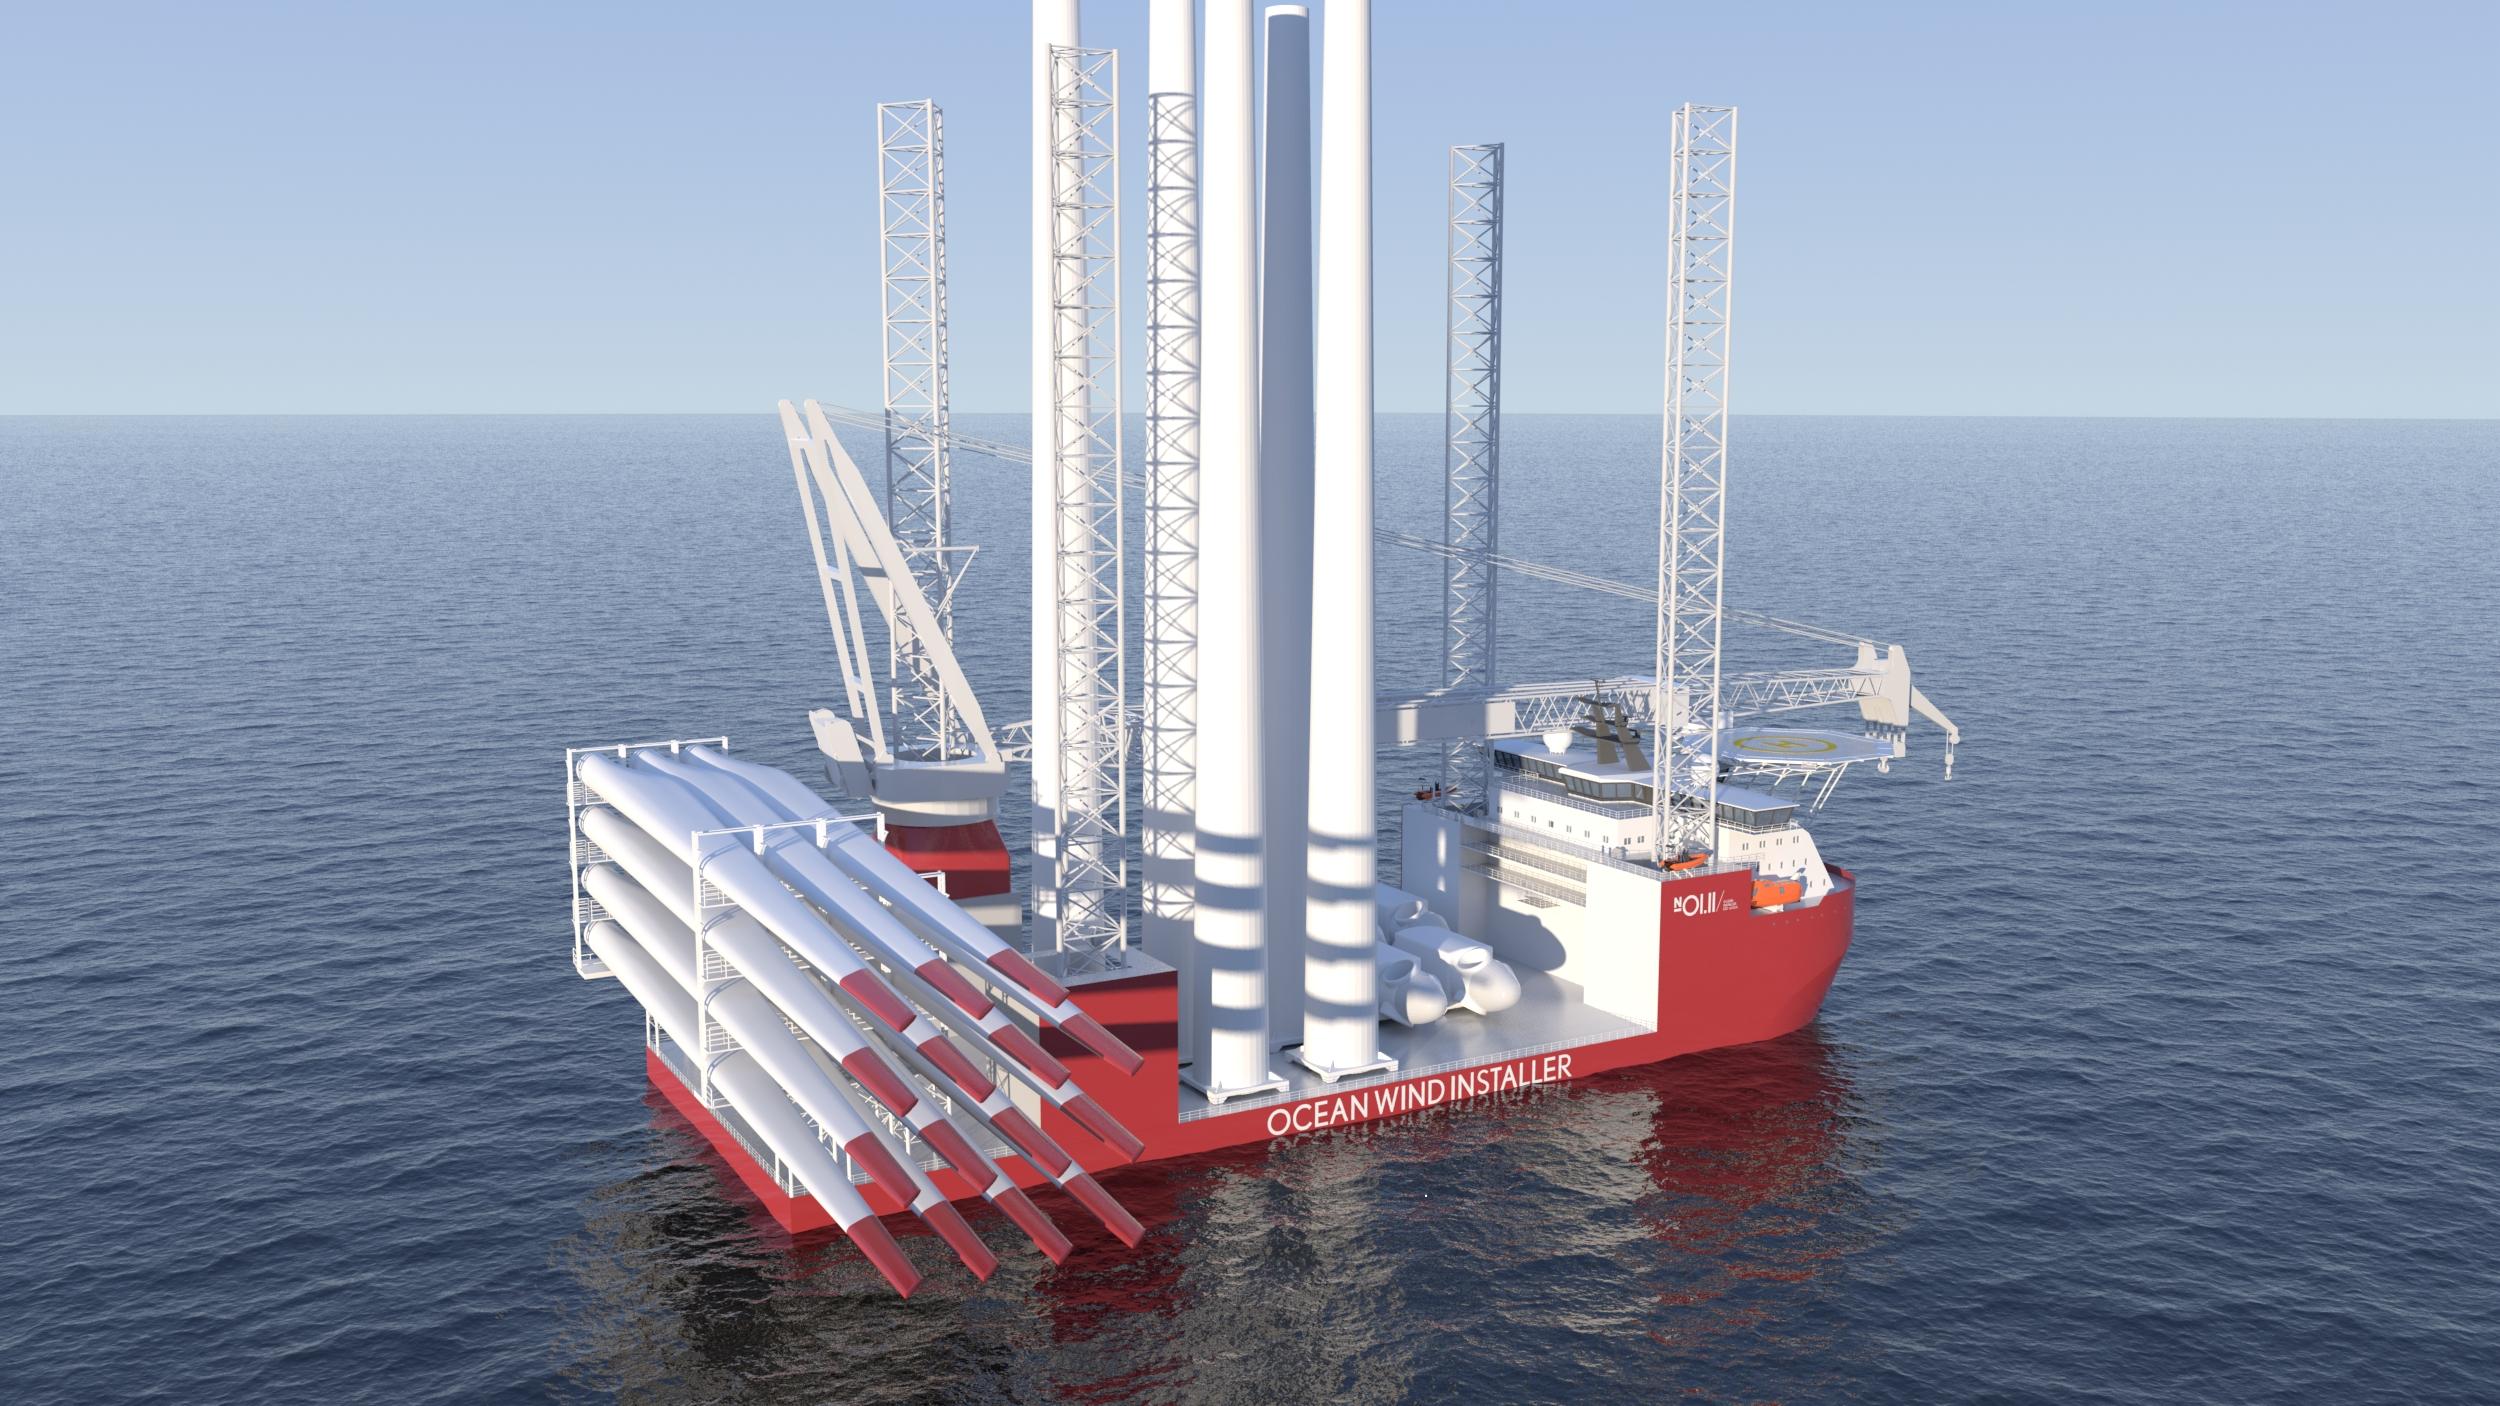 ocean-installer-turbine-vessel